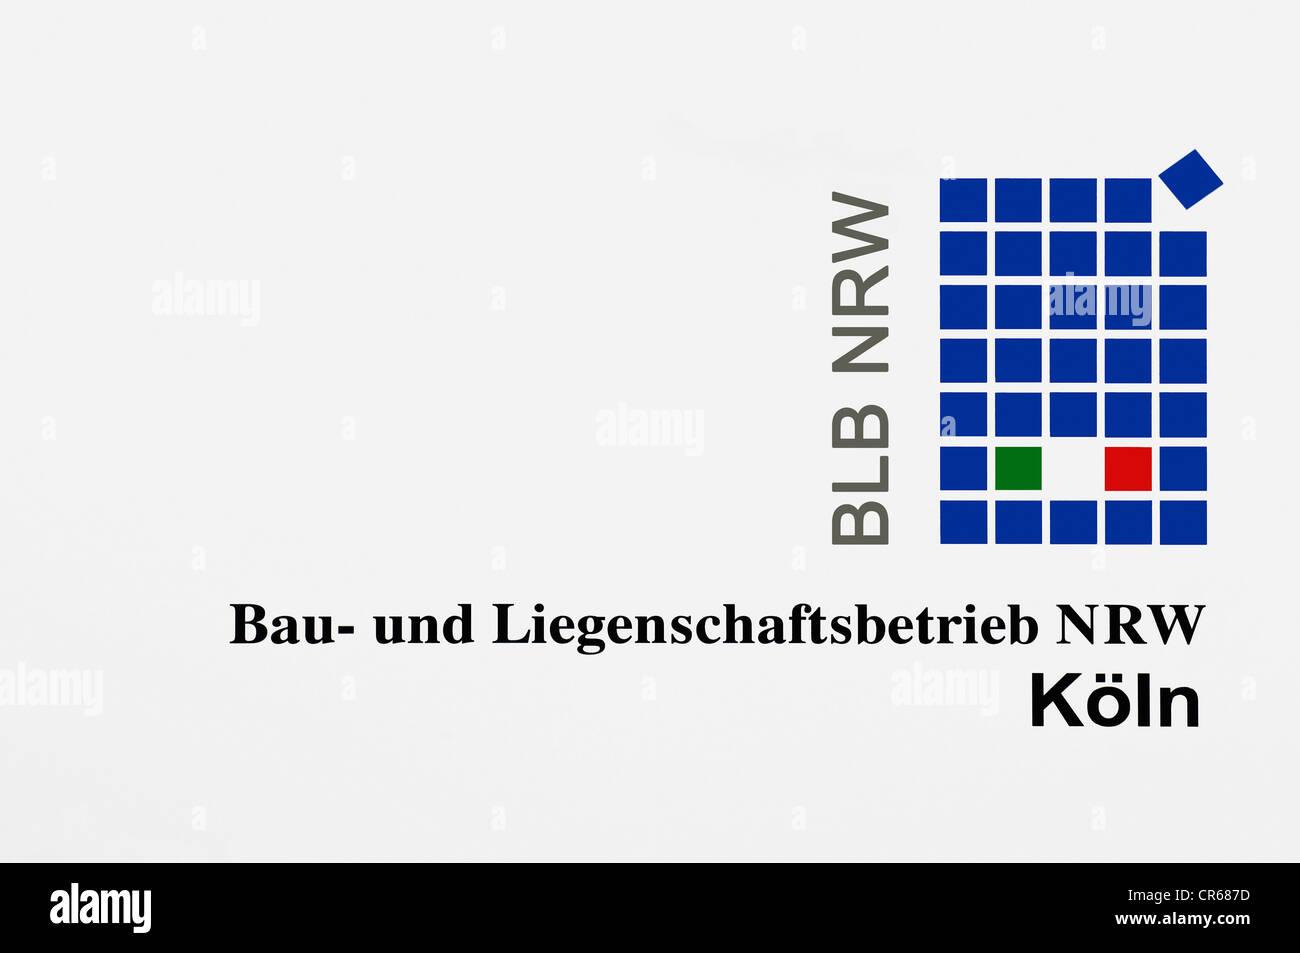 Logo of 'BLB NRW Bau- und Liegenschaftsbetrieb NRW Koeln', construction and property company in Cologne, - Stock Image